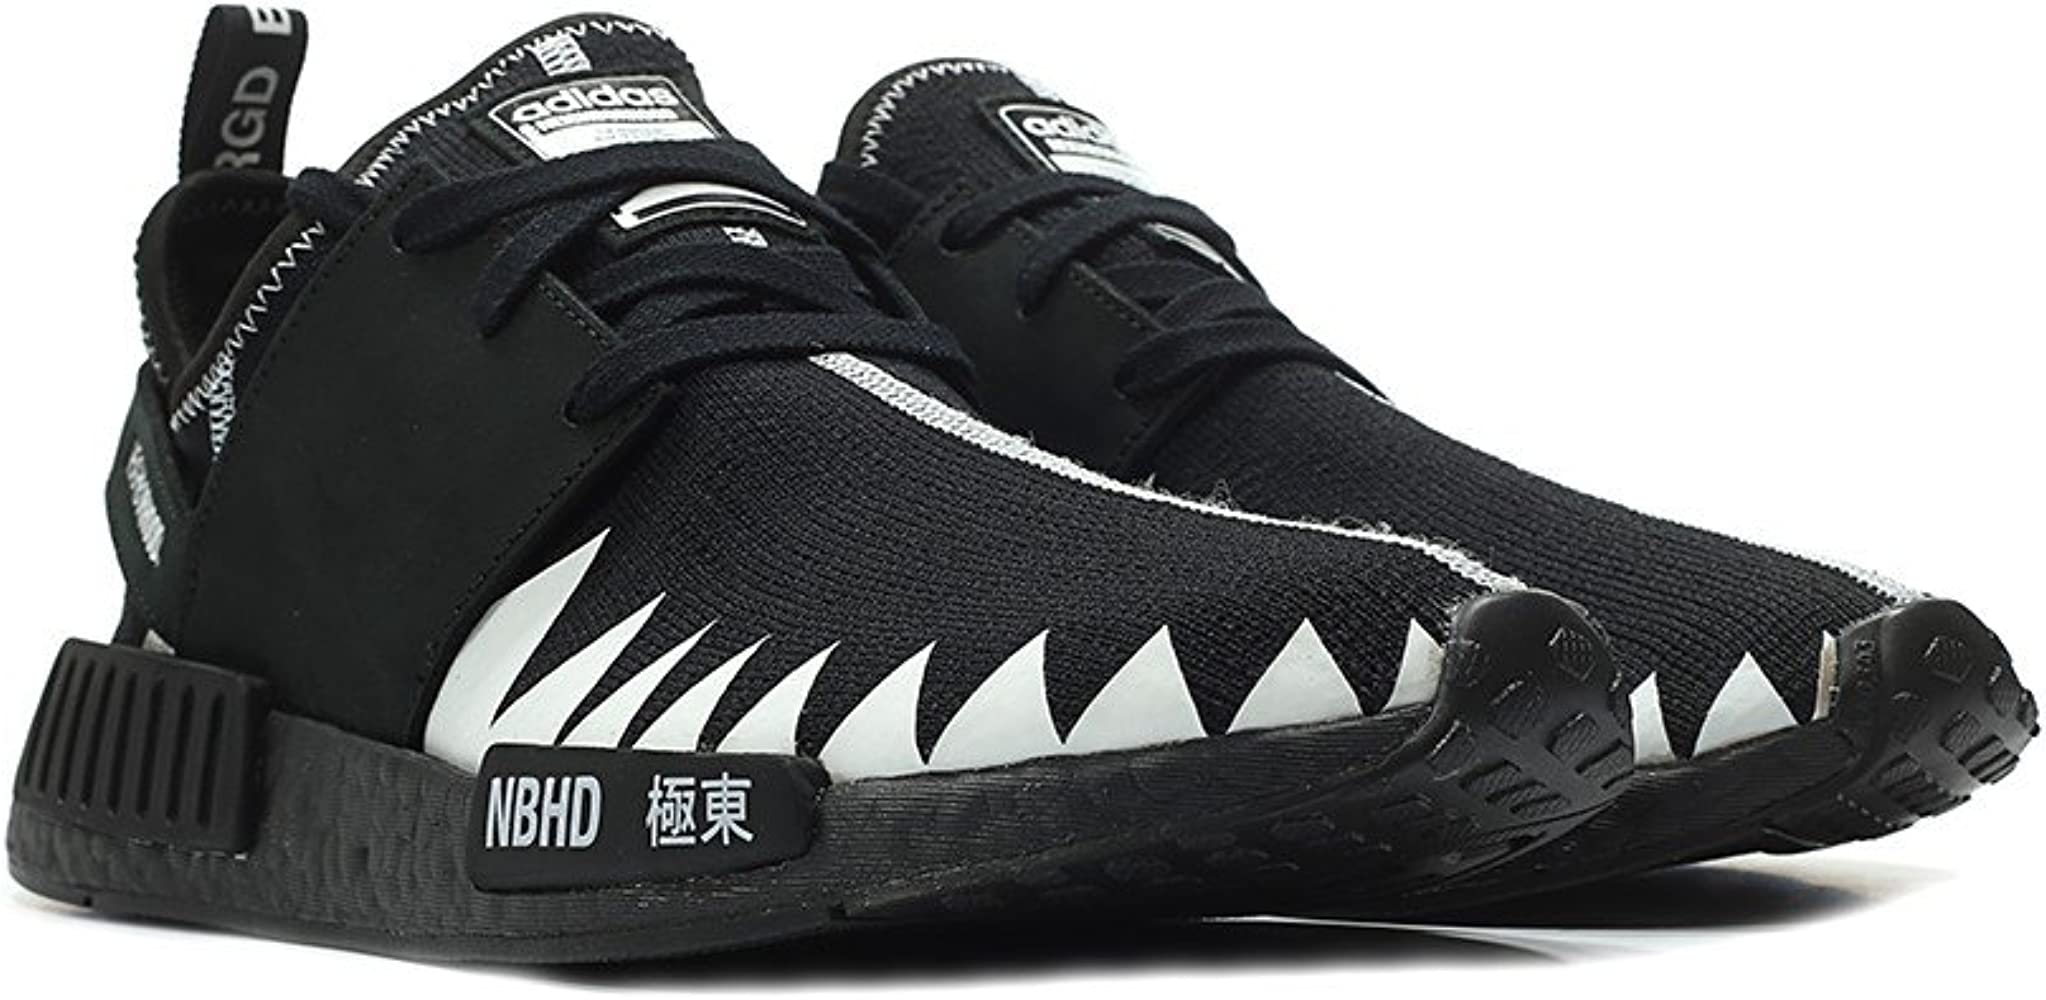 reputable site 8dba3 89812 adidas NMD R1 Neighborhood CORE Black DA8835 US Size 10 ...